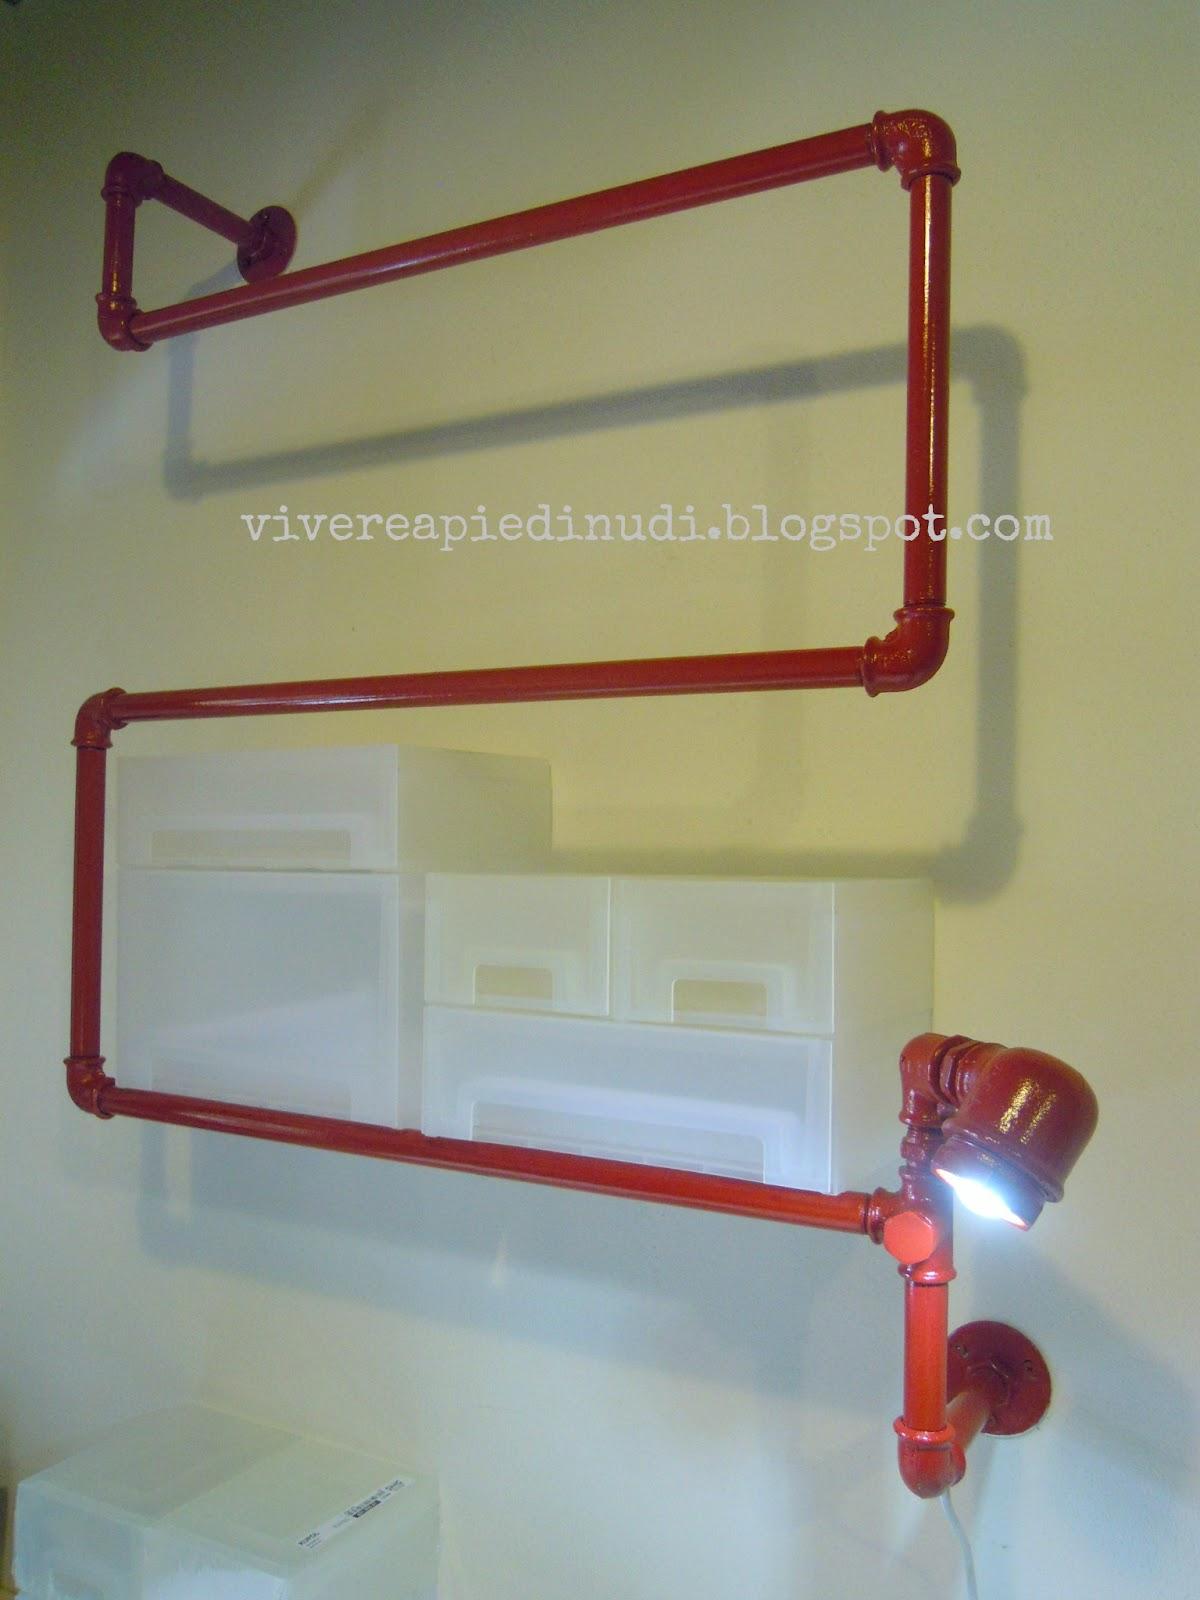 Lampade con tubi idraulici ry03 regardsdefemmes for Planimetrie da 1200 piedi quadrati